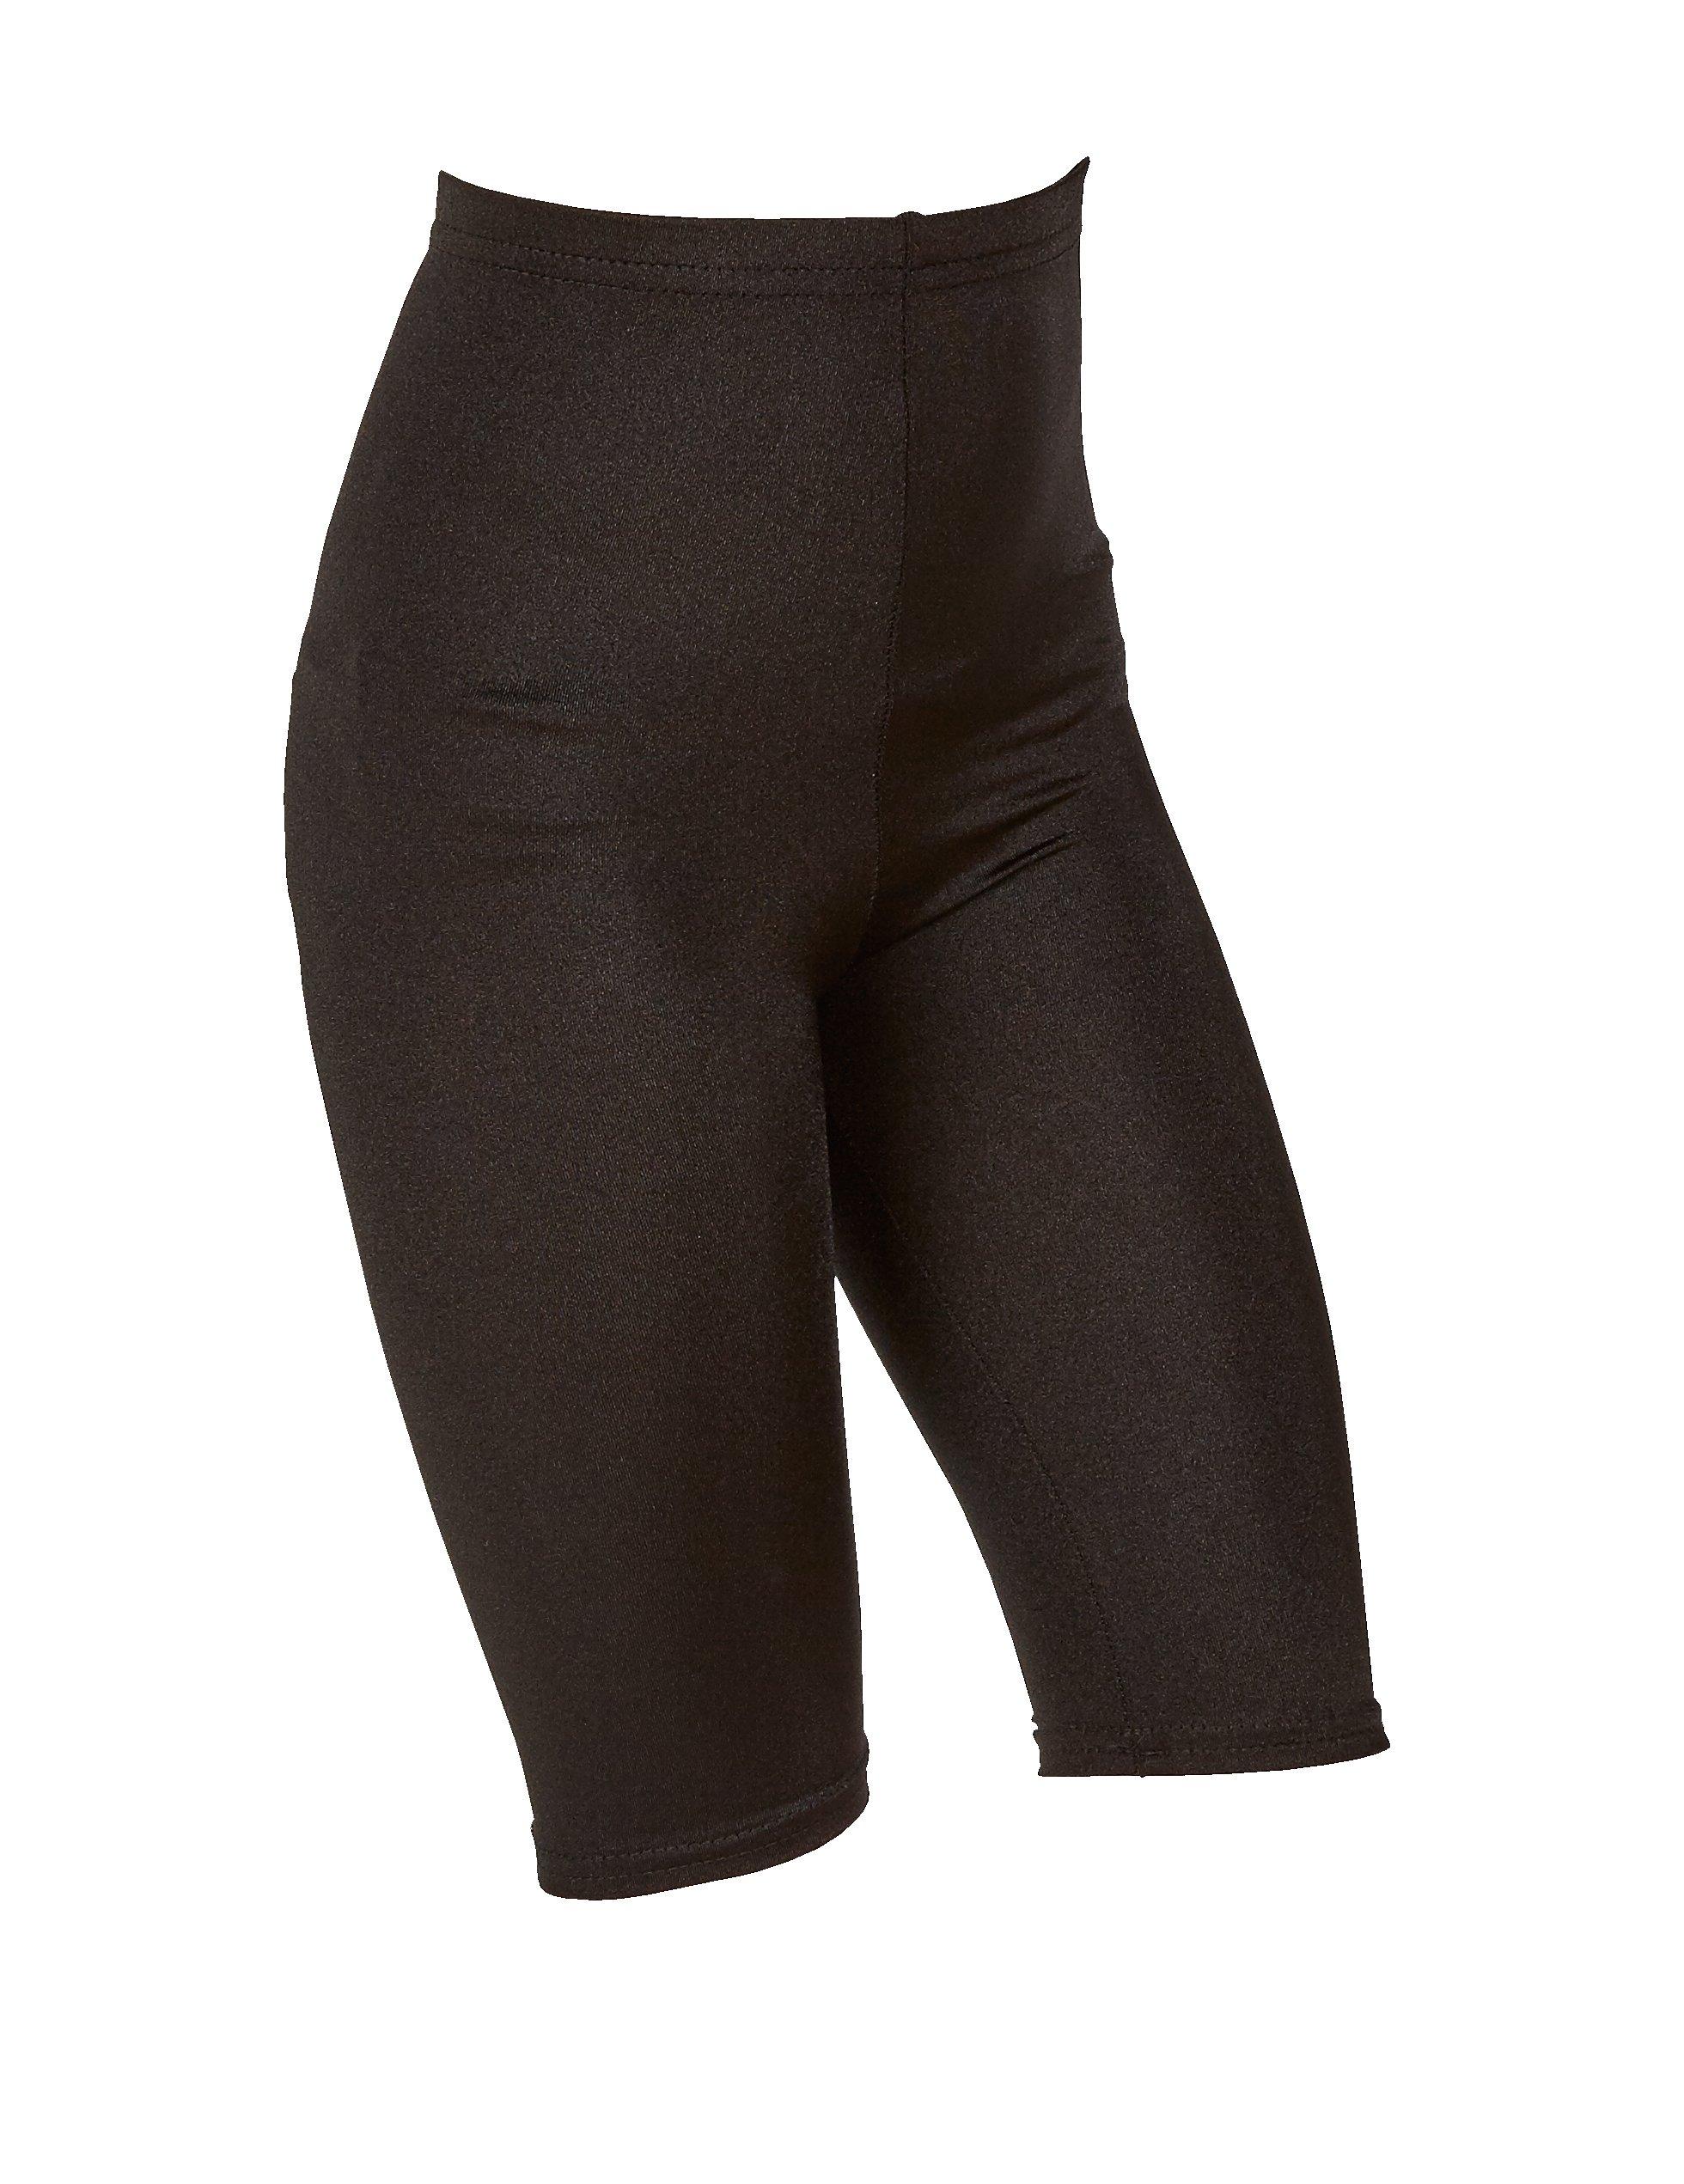 Girls Kids Nylon Lycra Sports Cycling Shorts School Gym Games Dance Shorts Pants